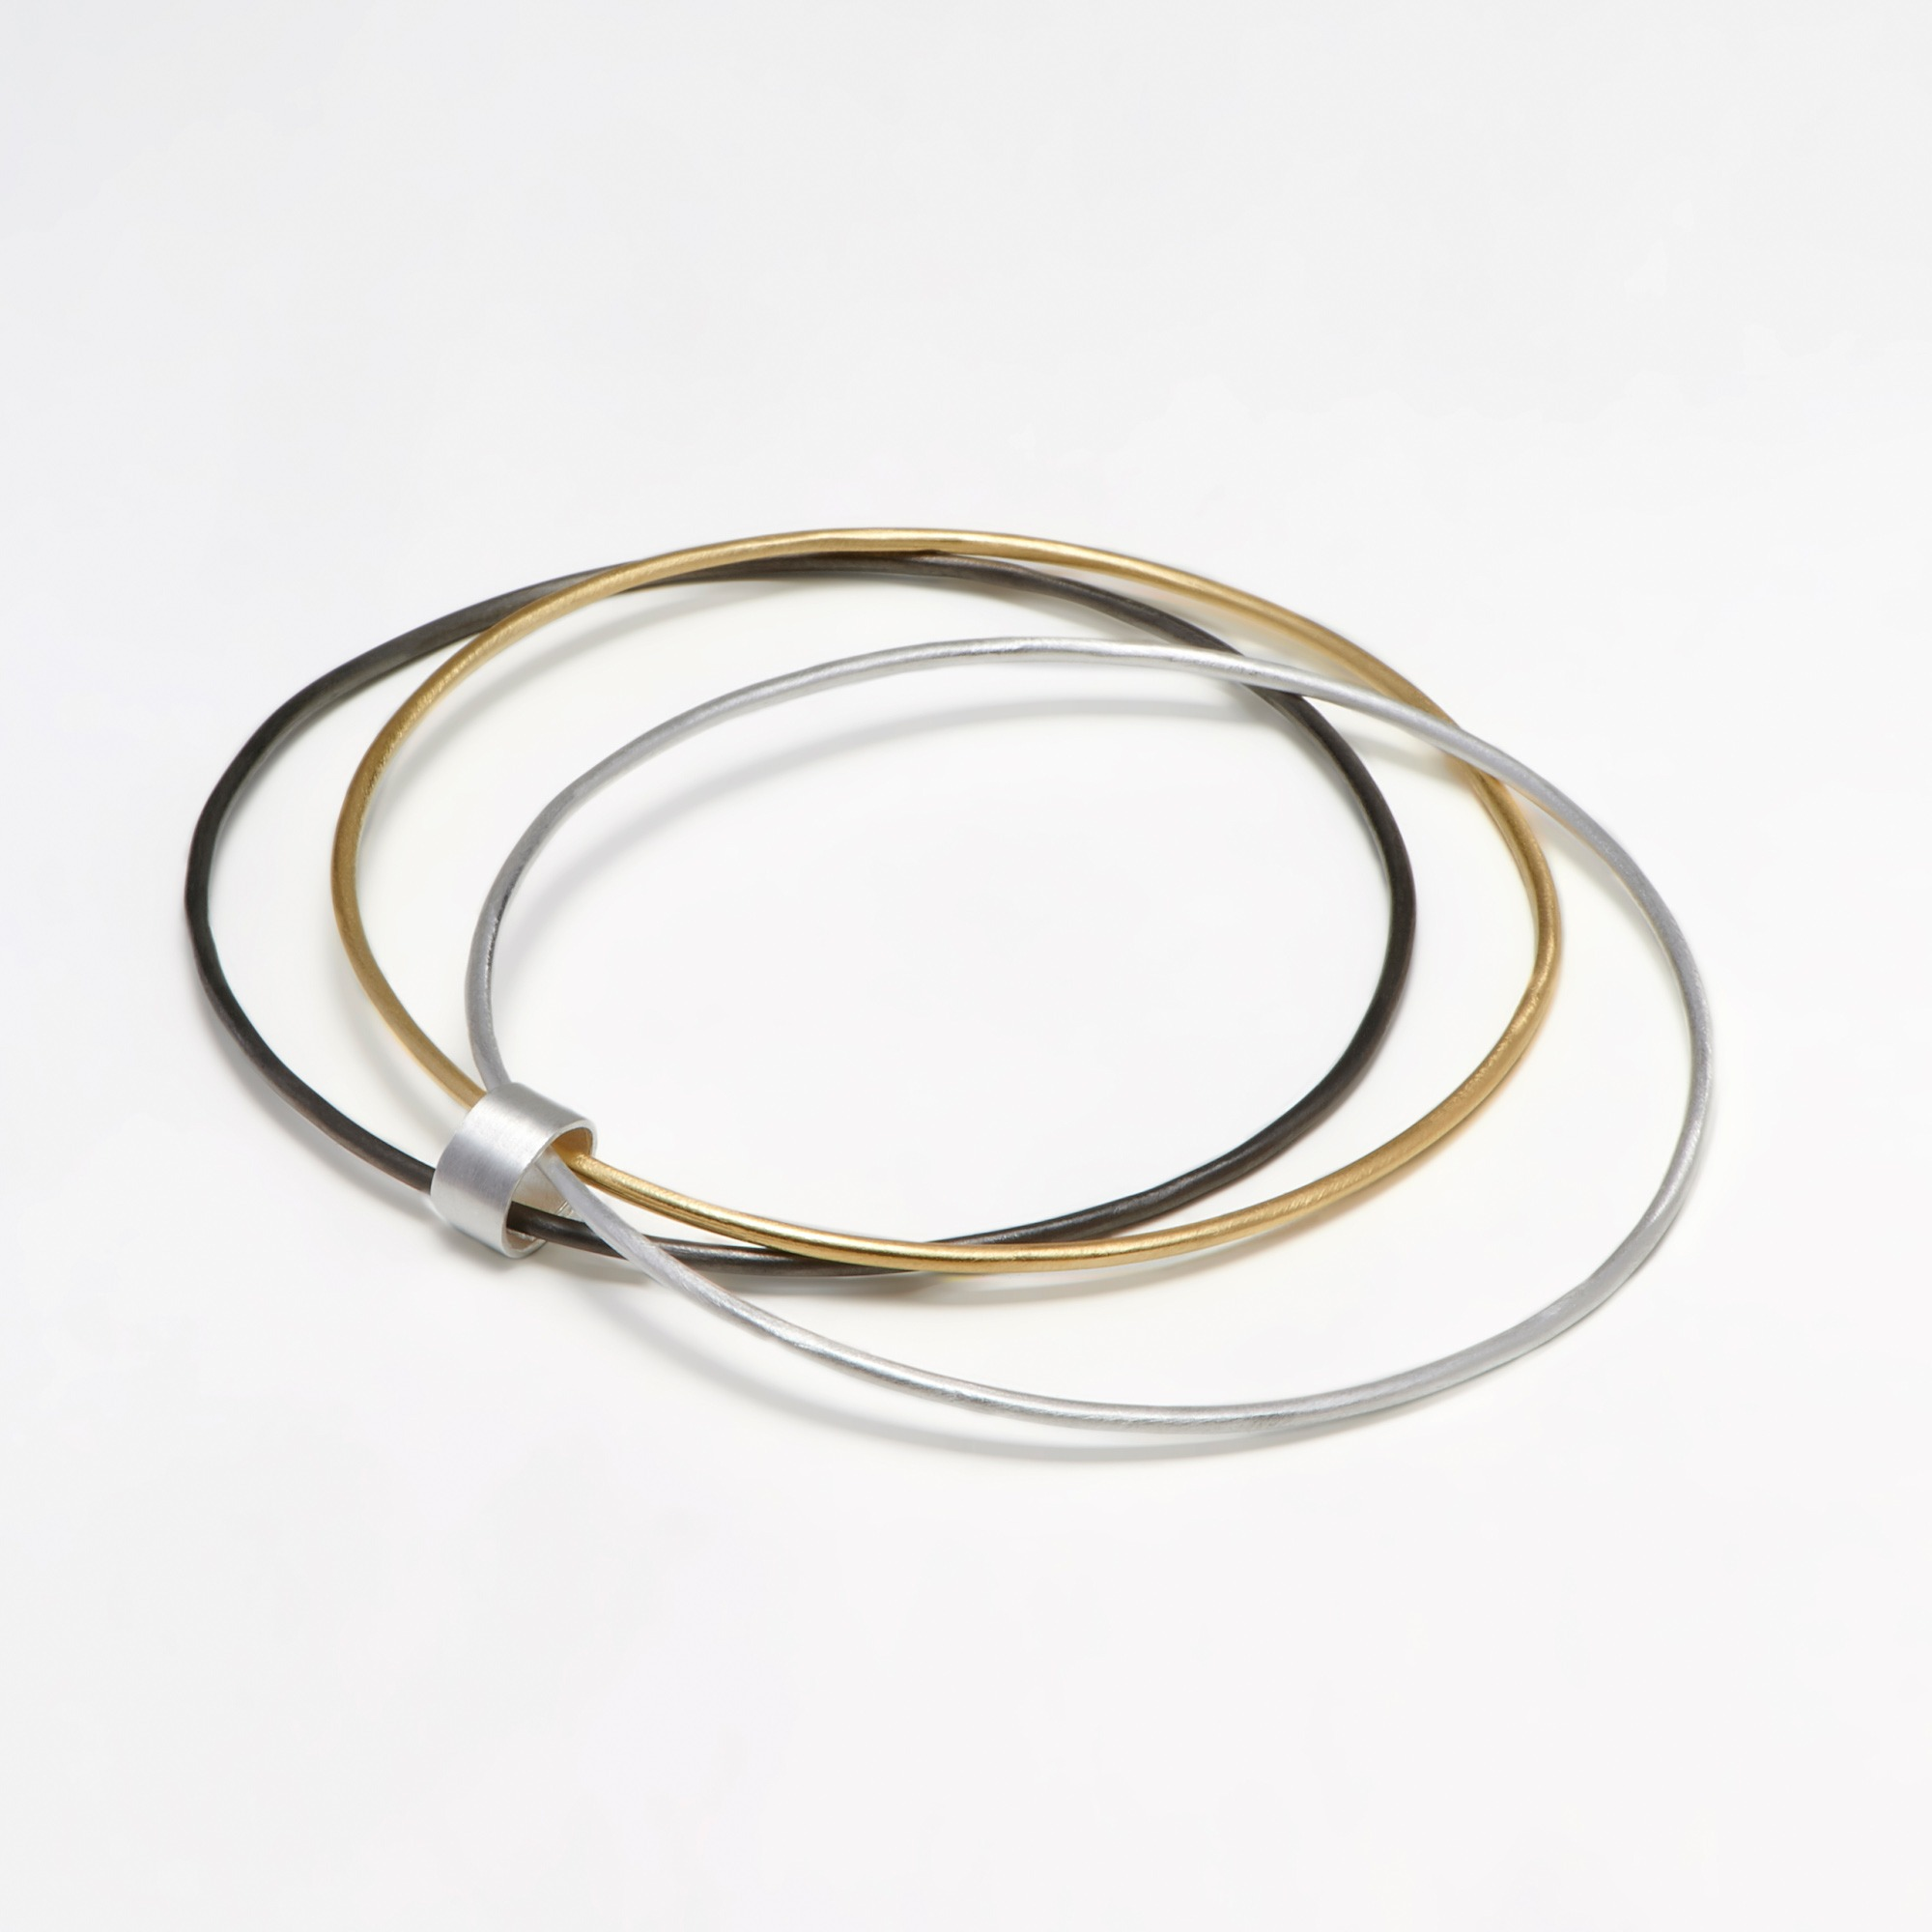 300-03 Cora bangles βραχιόλι ασήμι - επίχρυσο - μαύρο